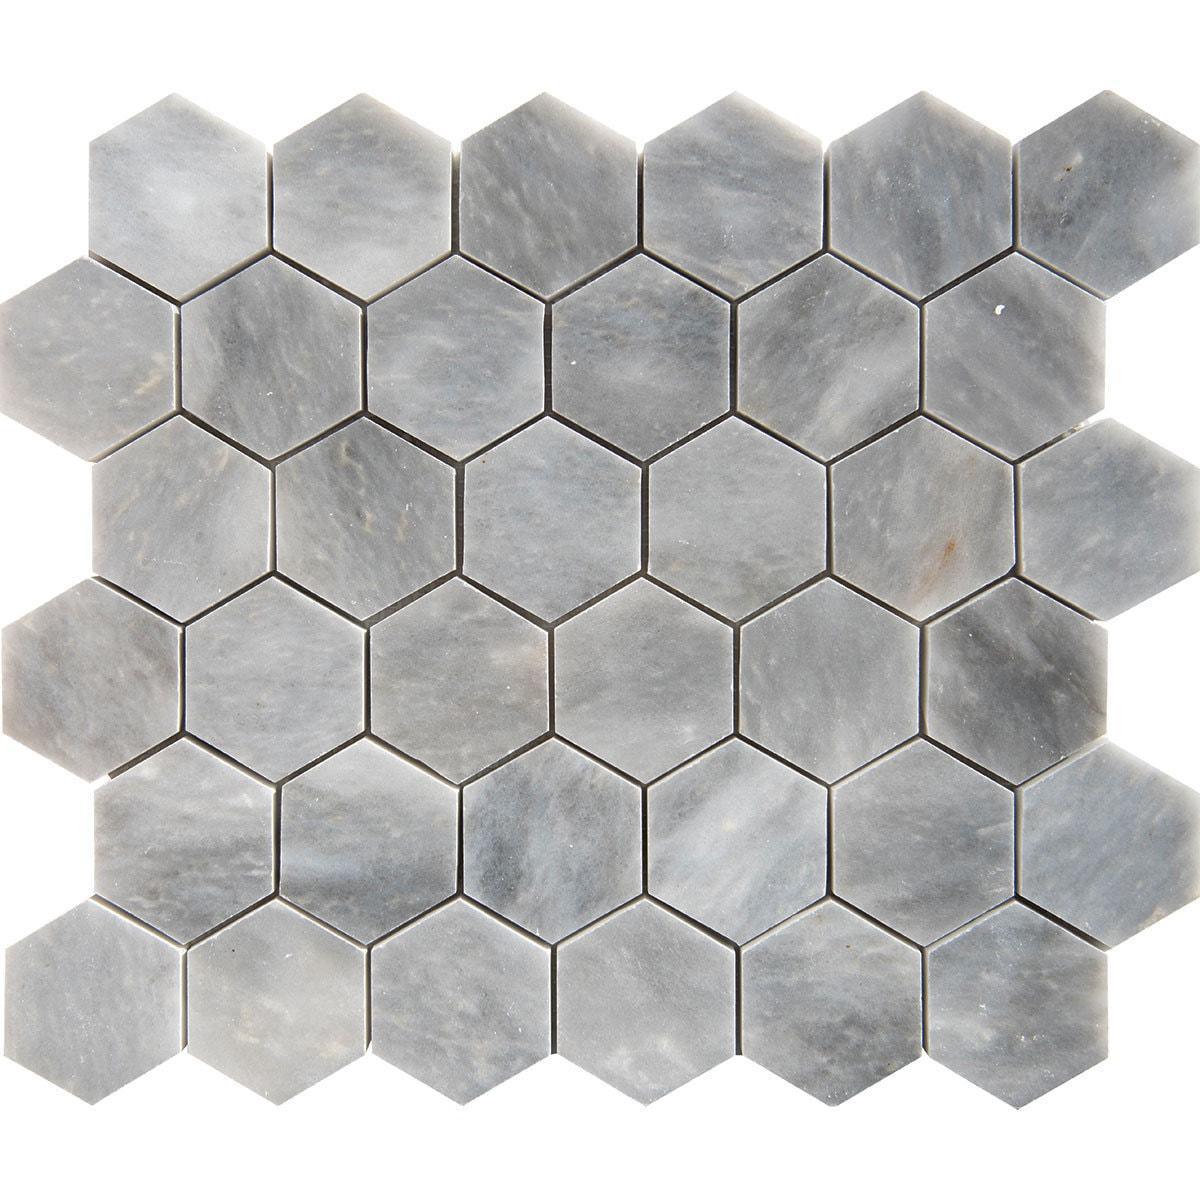 Afyon Grey Marble 2 Inch Hexagon Polished Tile Overstock 12876277